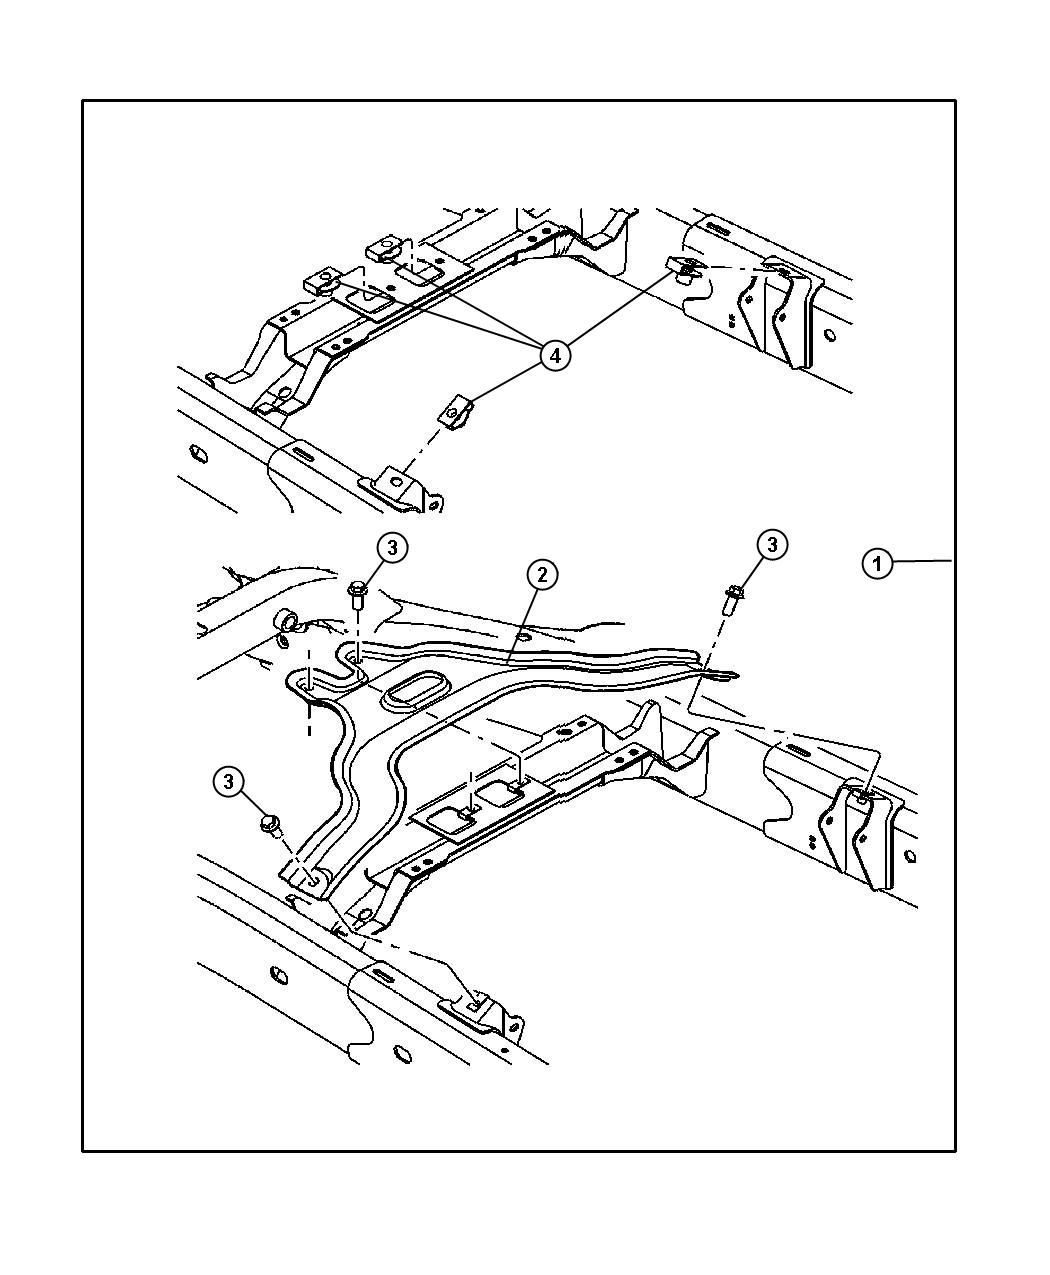 Dodge Durango Skid Plate Kit